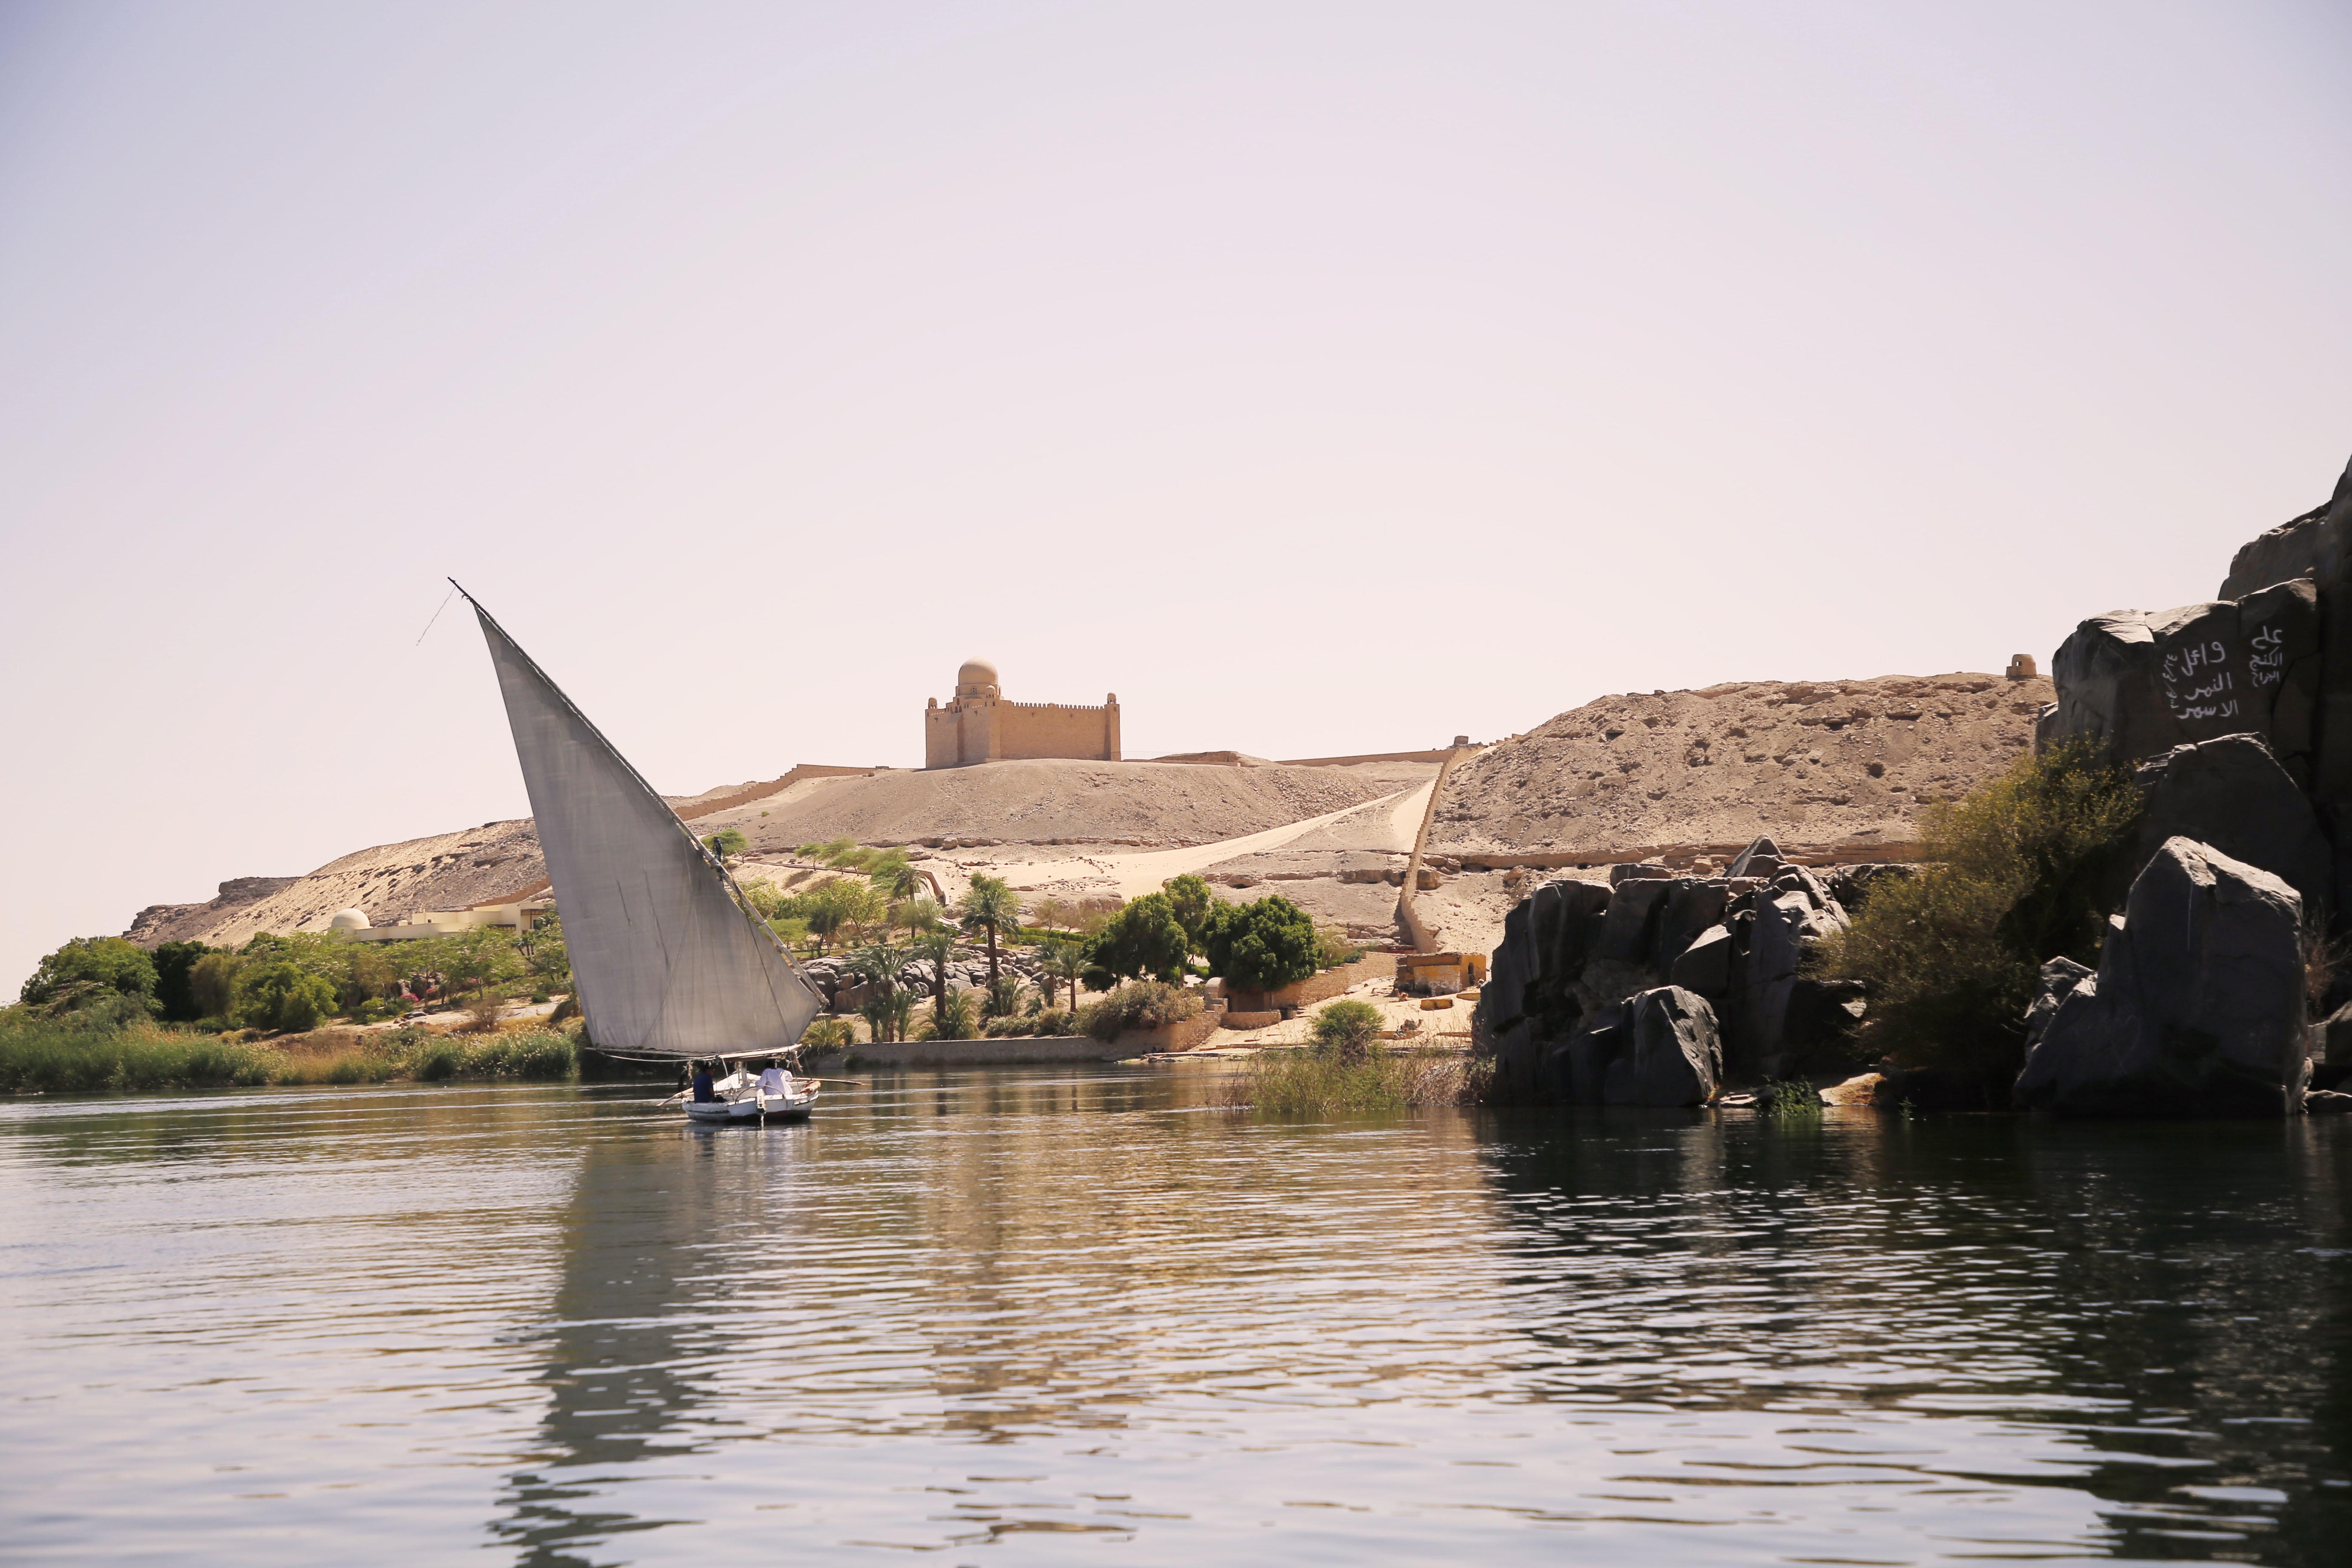 mia und ich blog Nil Nubier Dorf Feluke Assuan Ägypten Egypt